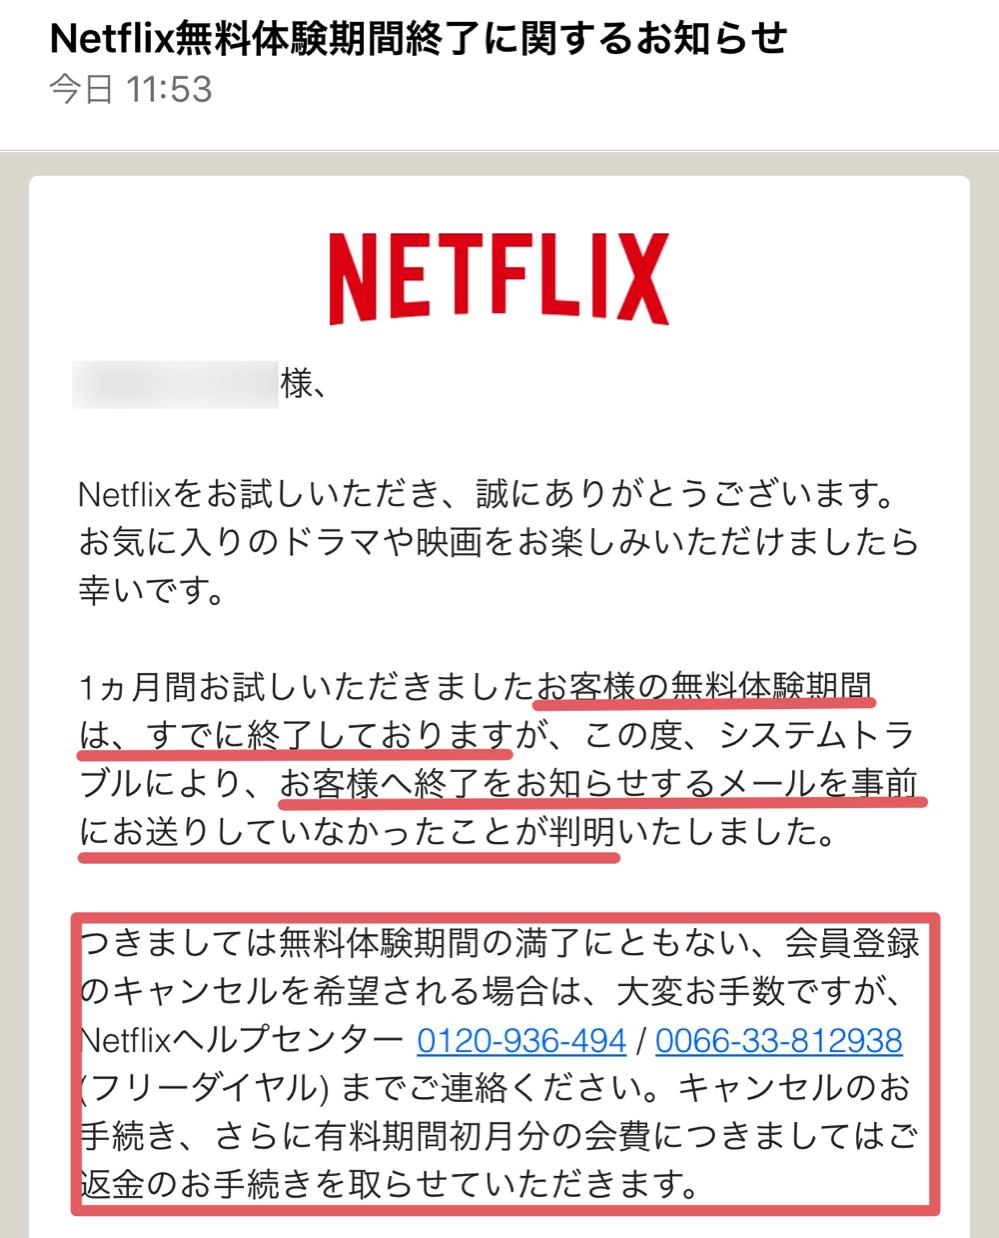 Netflix owabimail